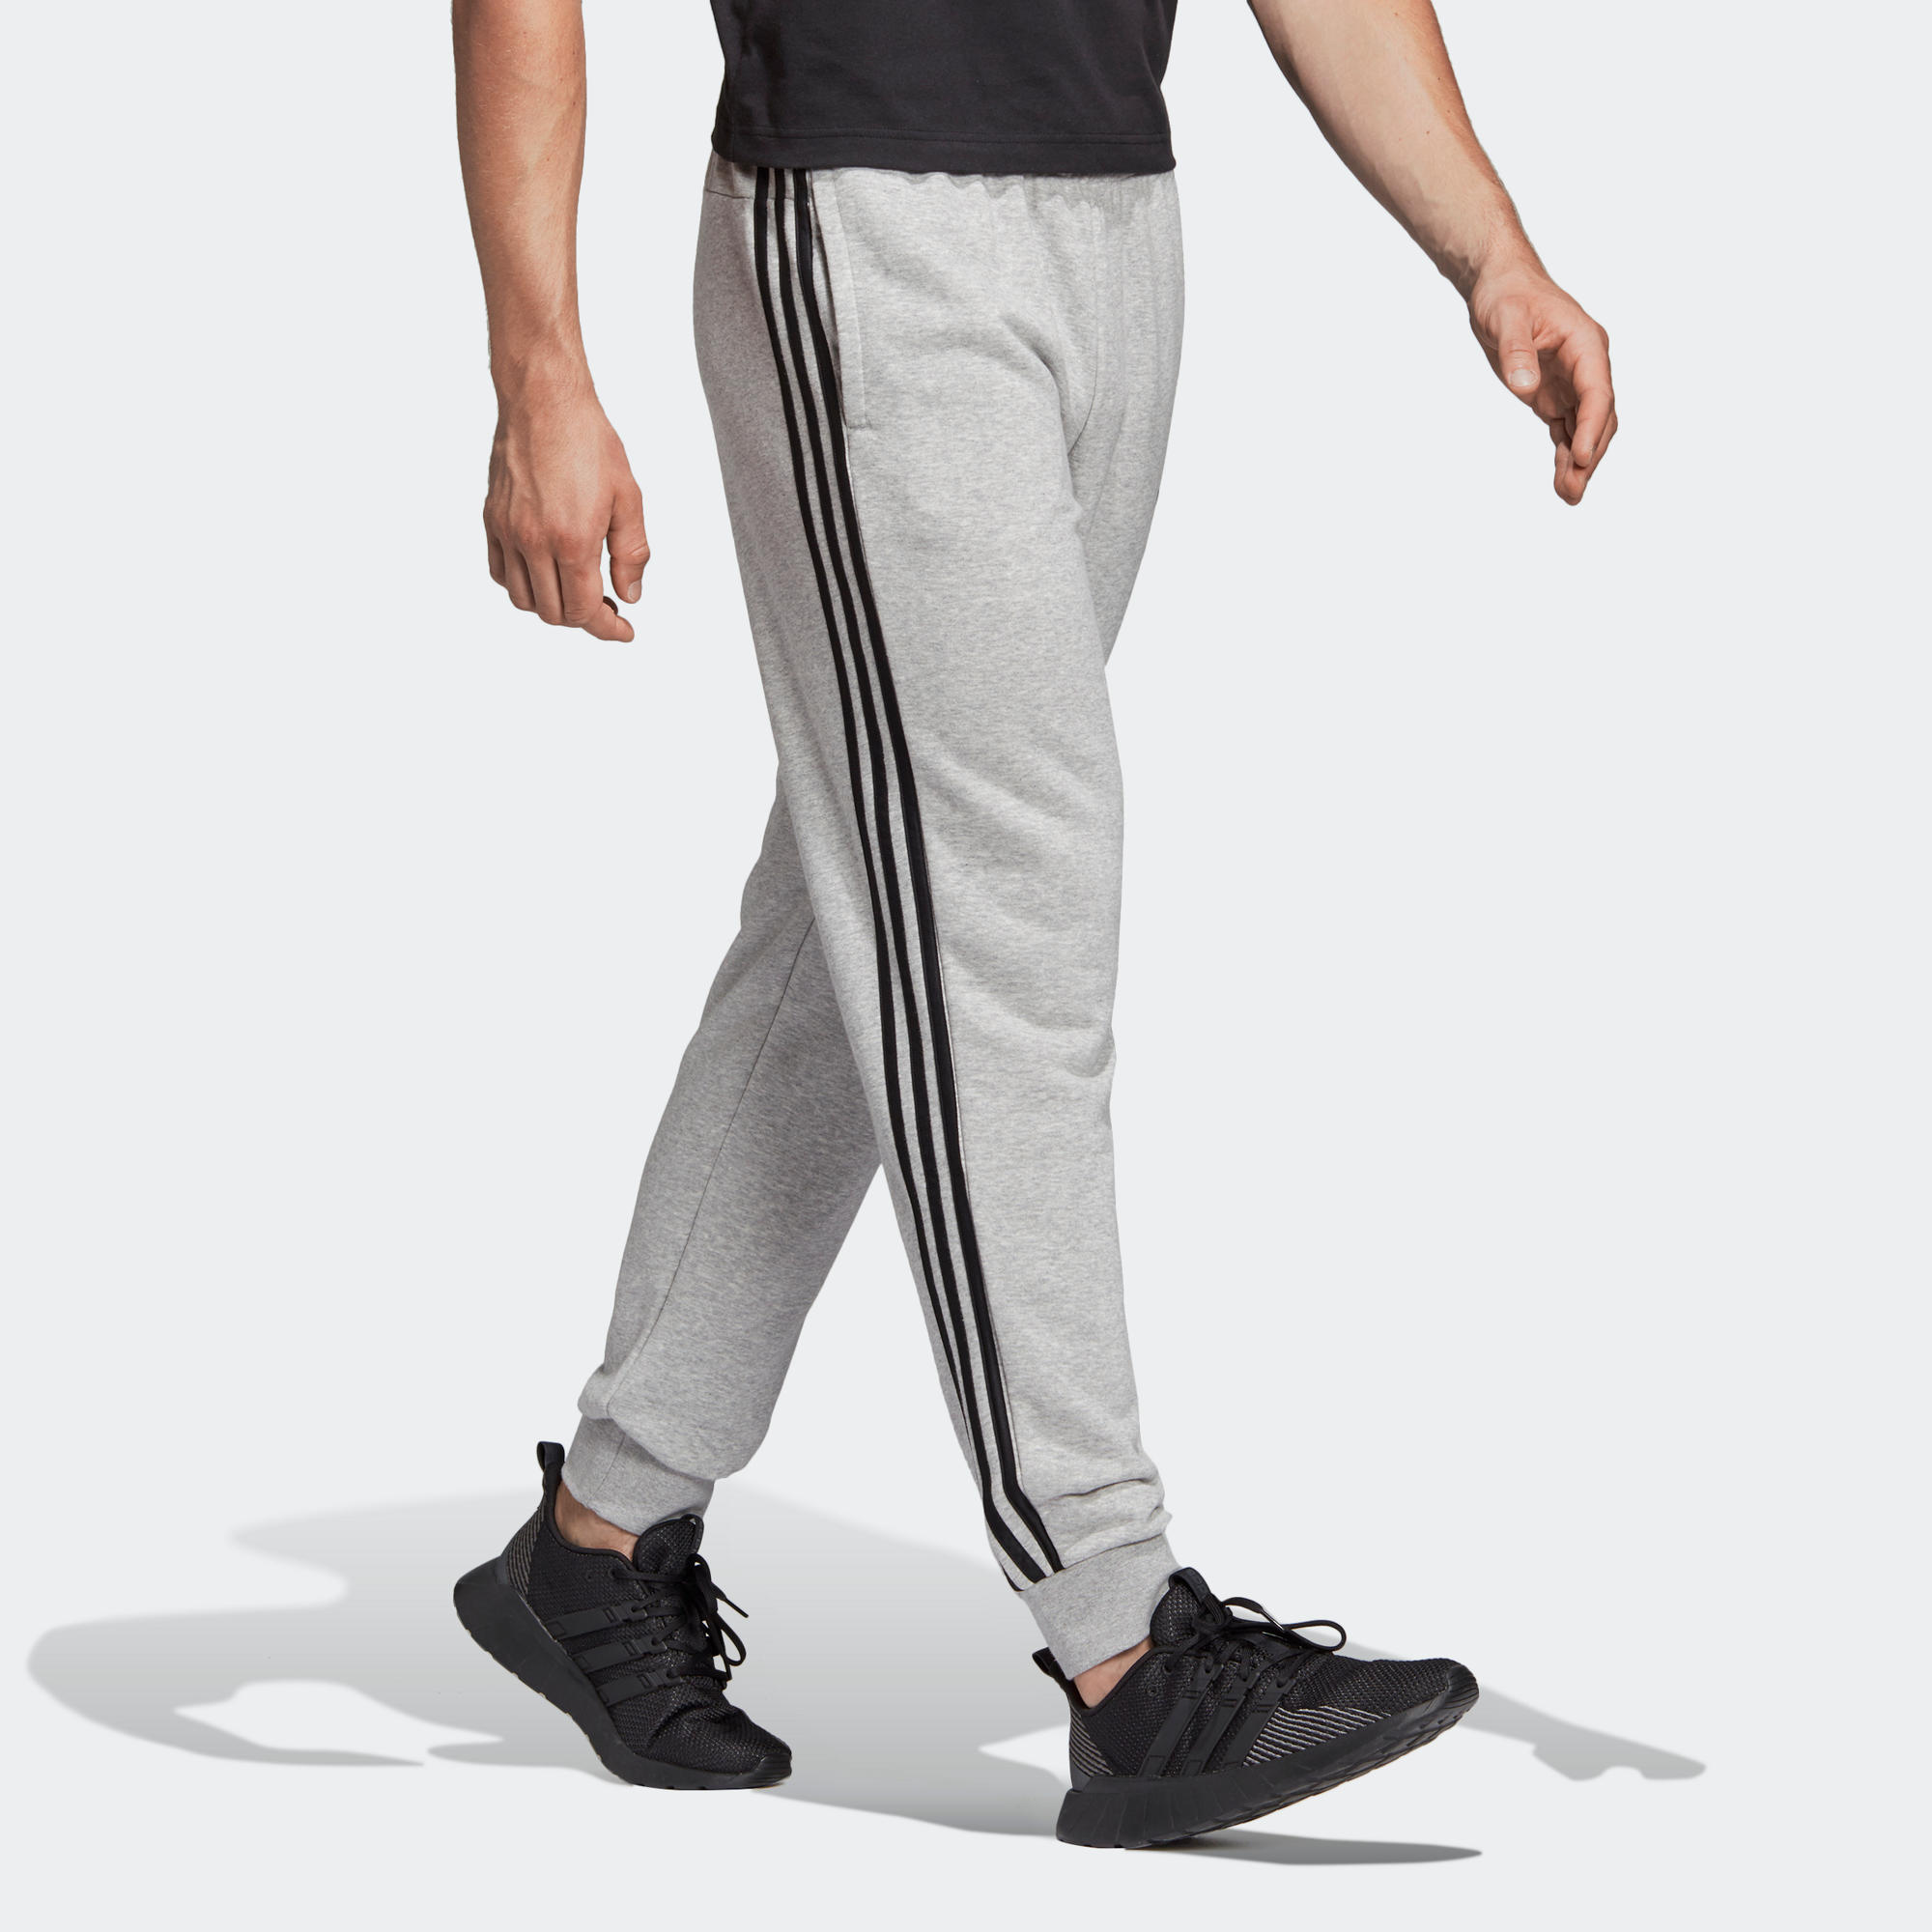 pantaloni adidas 3 stripes track pants in grey